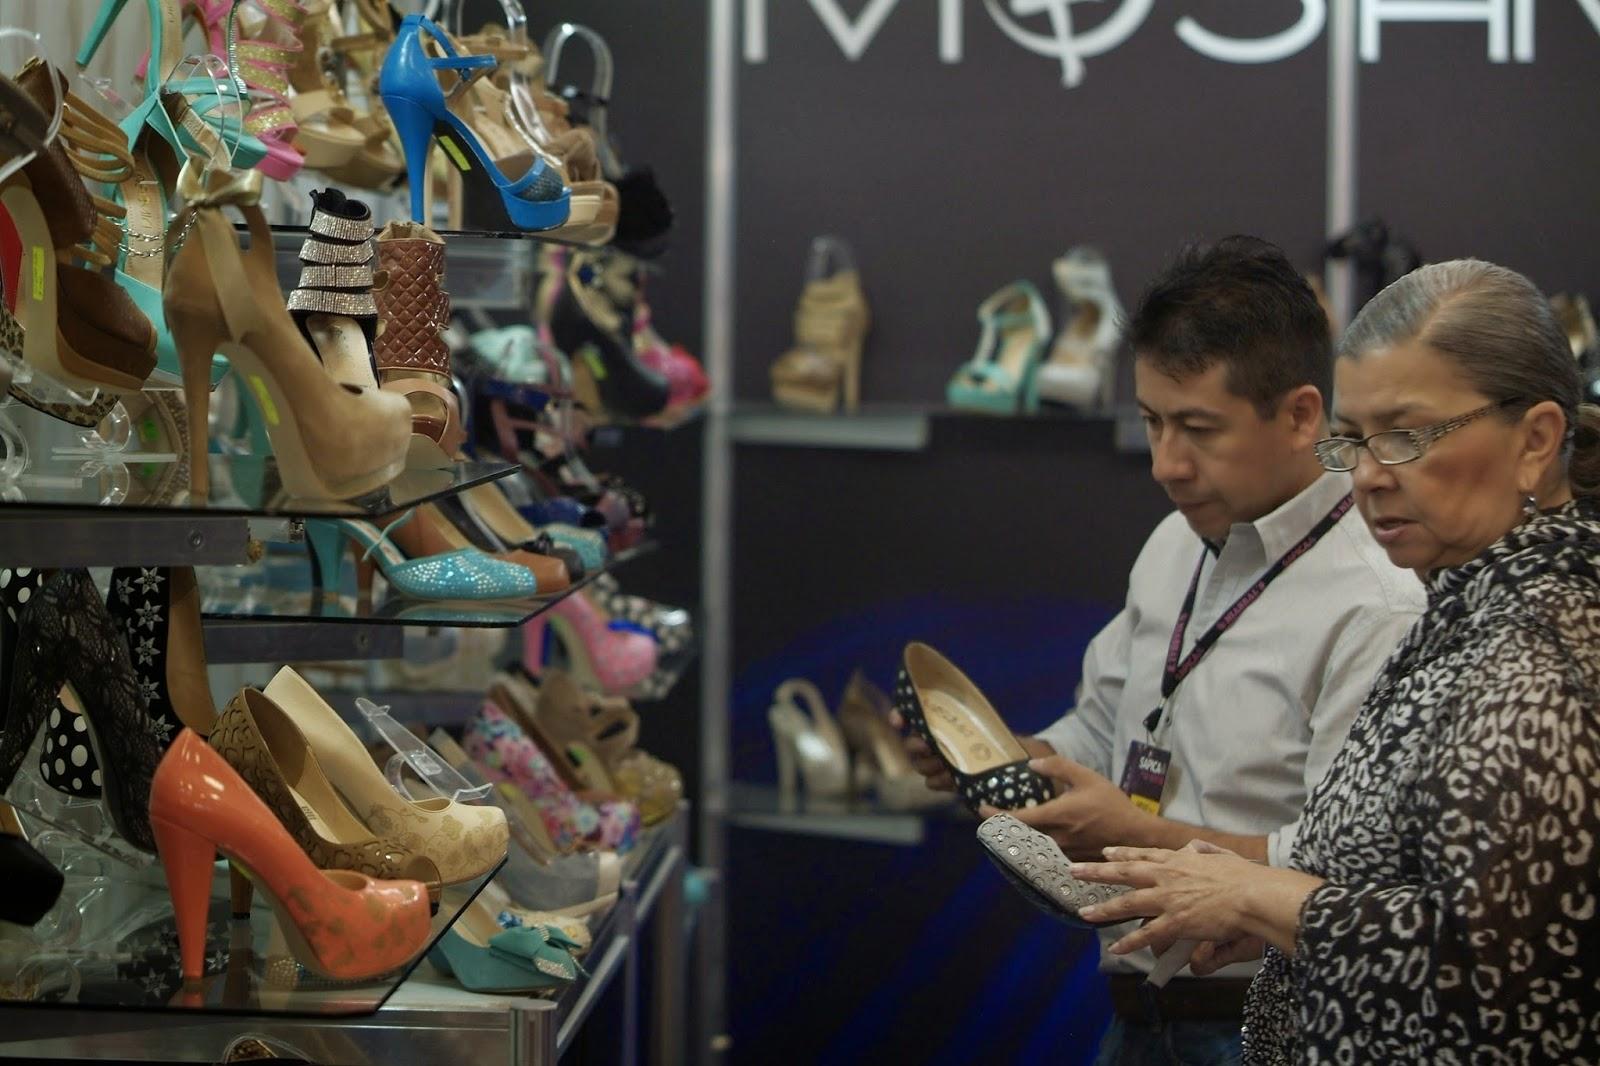 compradores, calzado de mujer, sapica, alta moda, calzado mexicano, sapica marzo 2014, compradores.